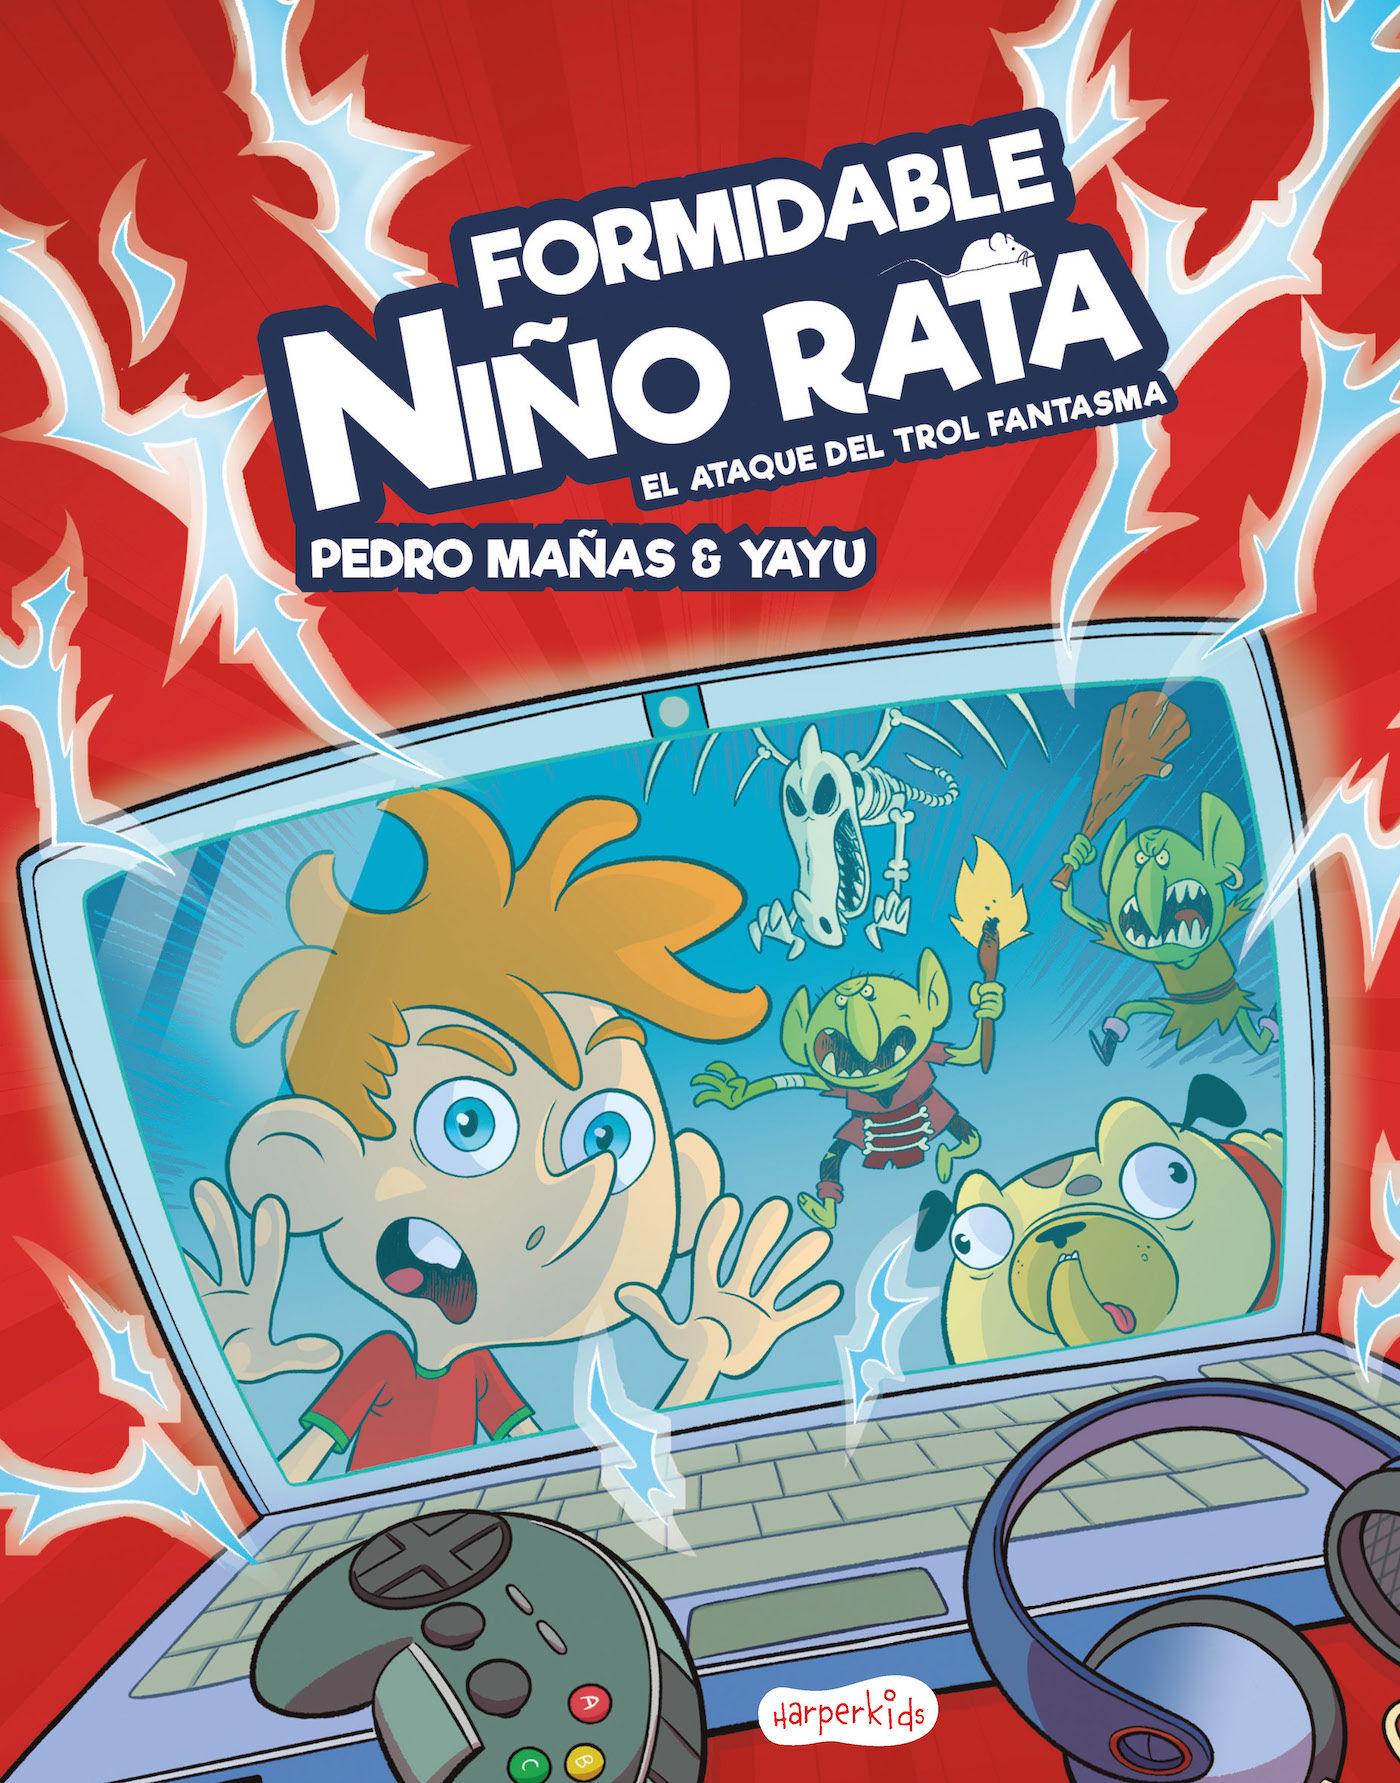 FORMIDABLE NIÑO RATA 1 EL ATAQUE DEL TROL FANTASMA